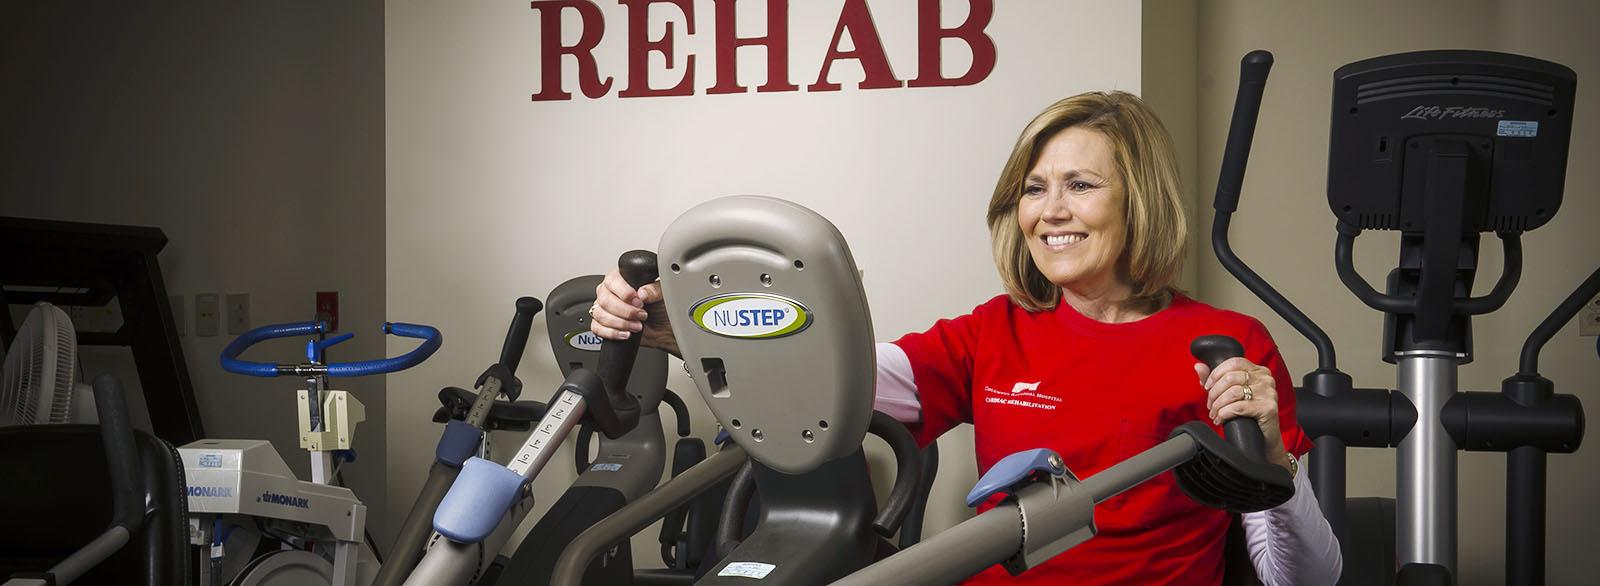 Cardiac rehab patient exercising